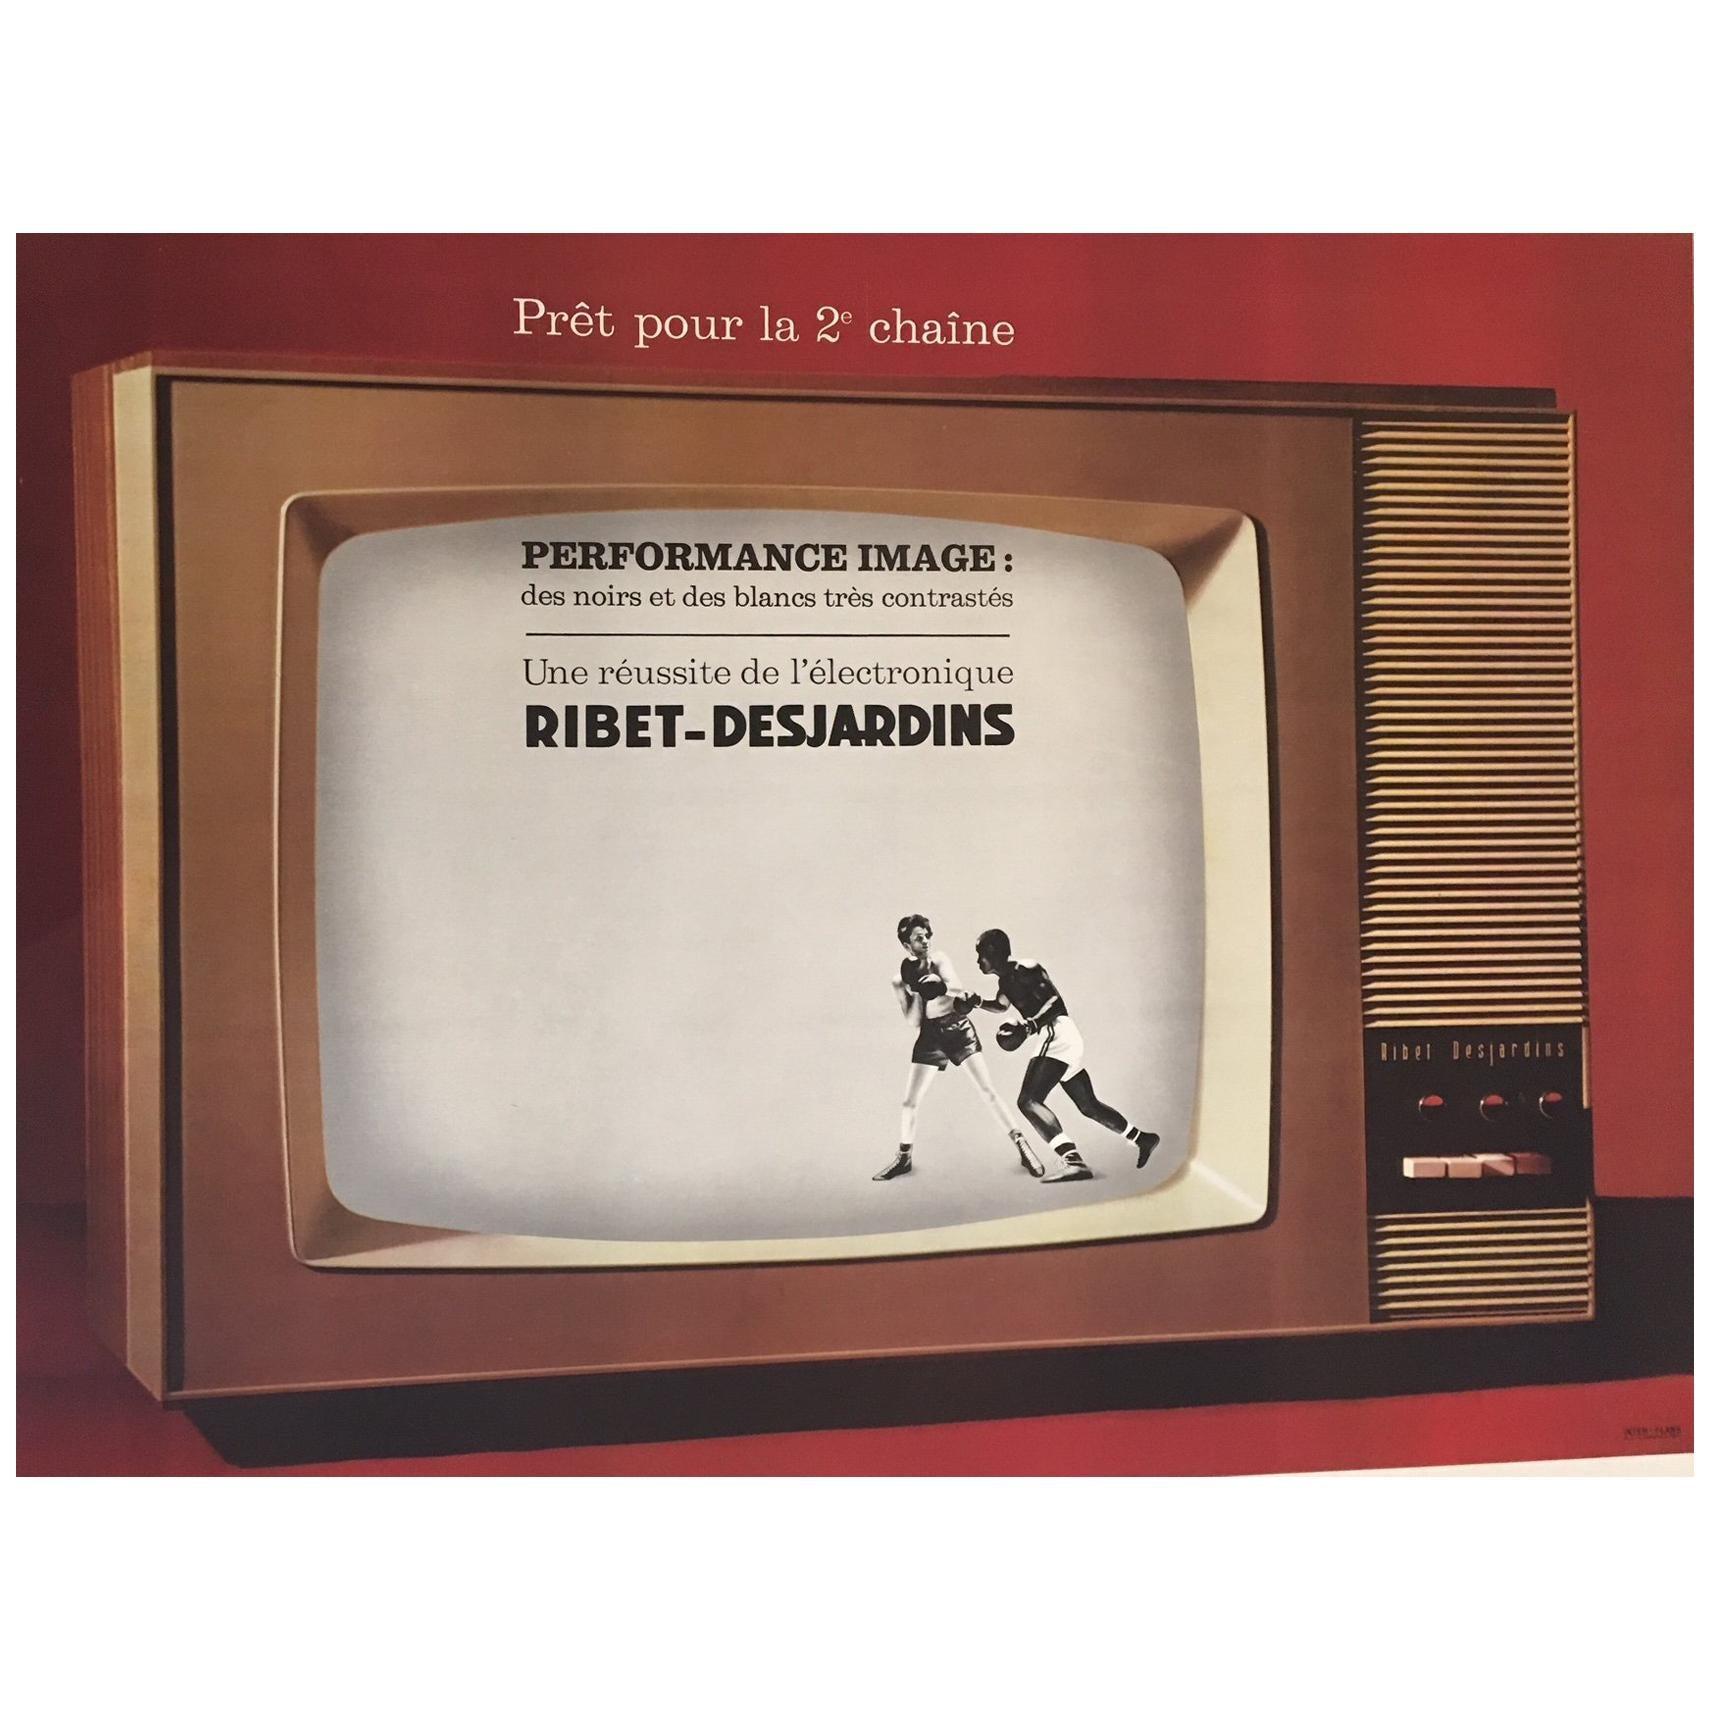 Original Vintage French Poster, Performance Image Television, 1960